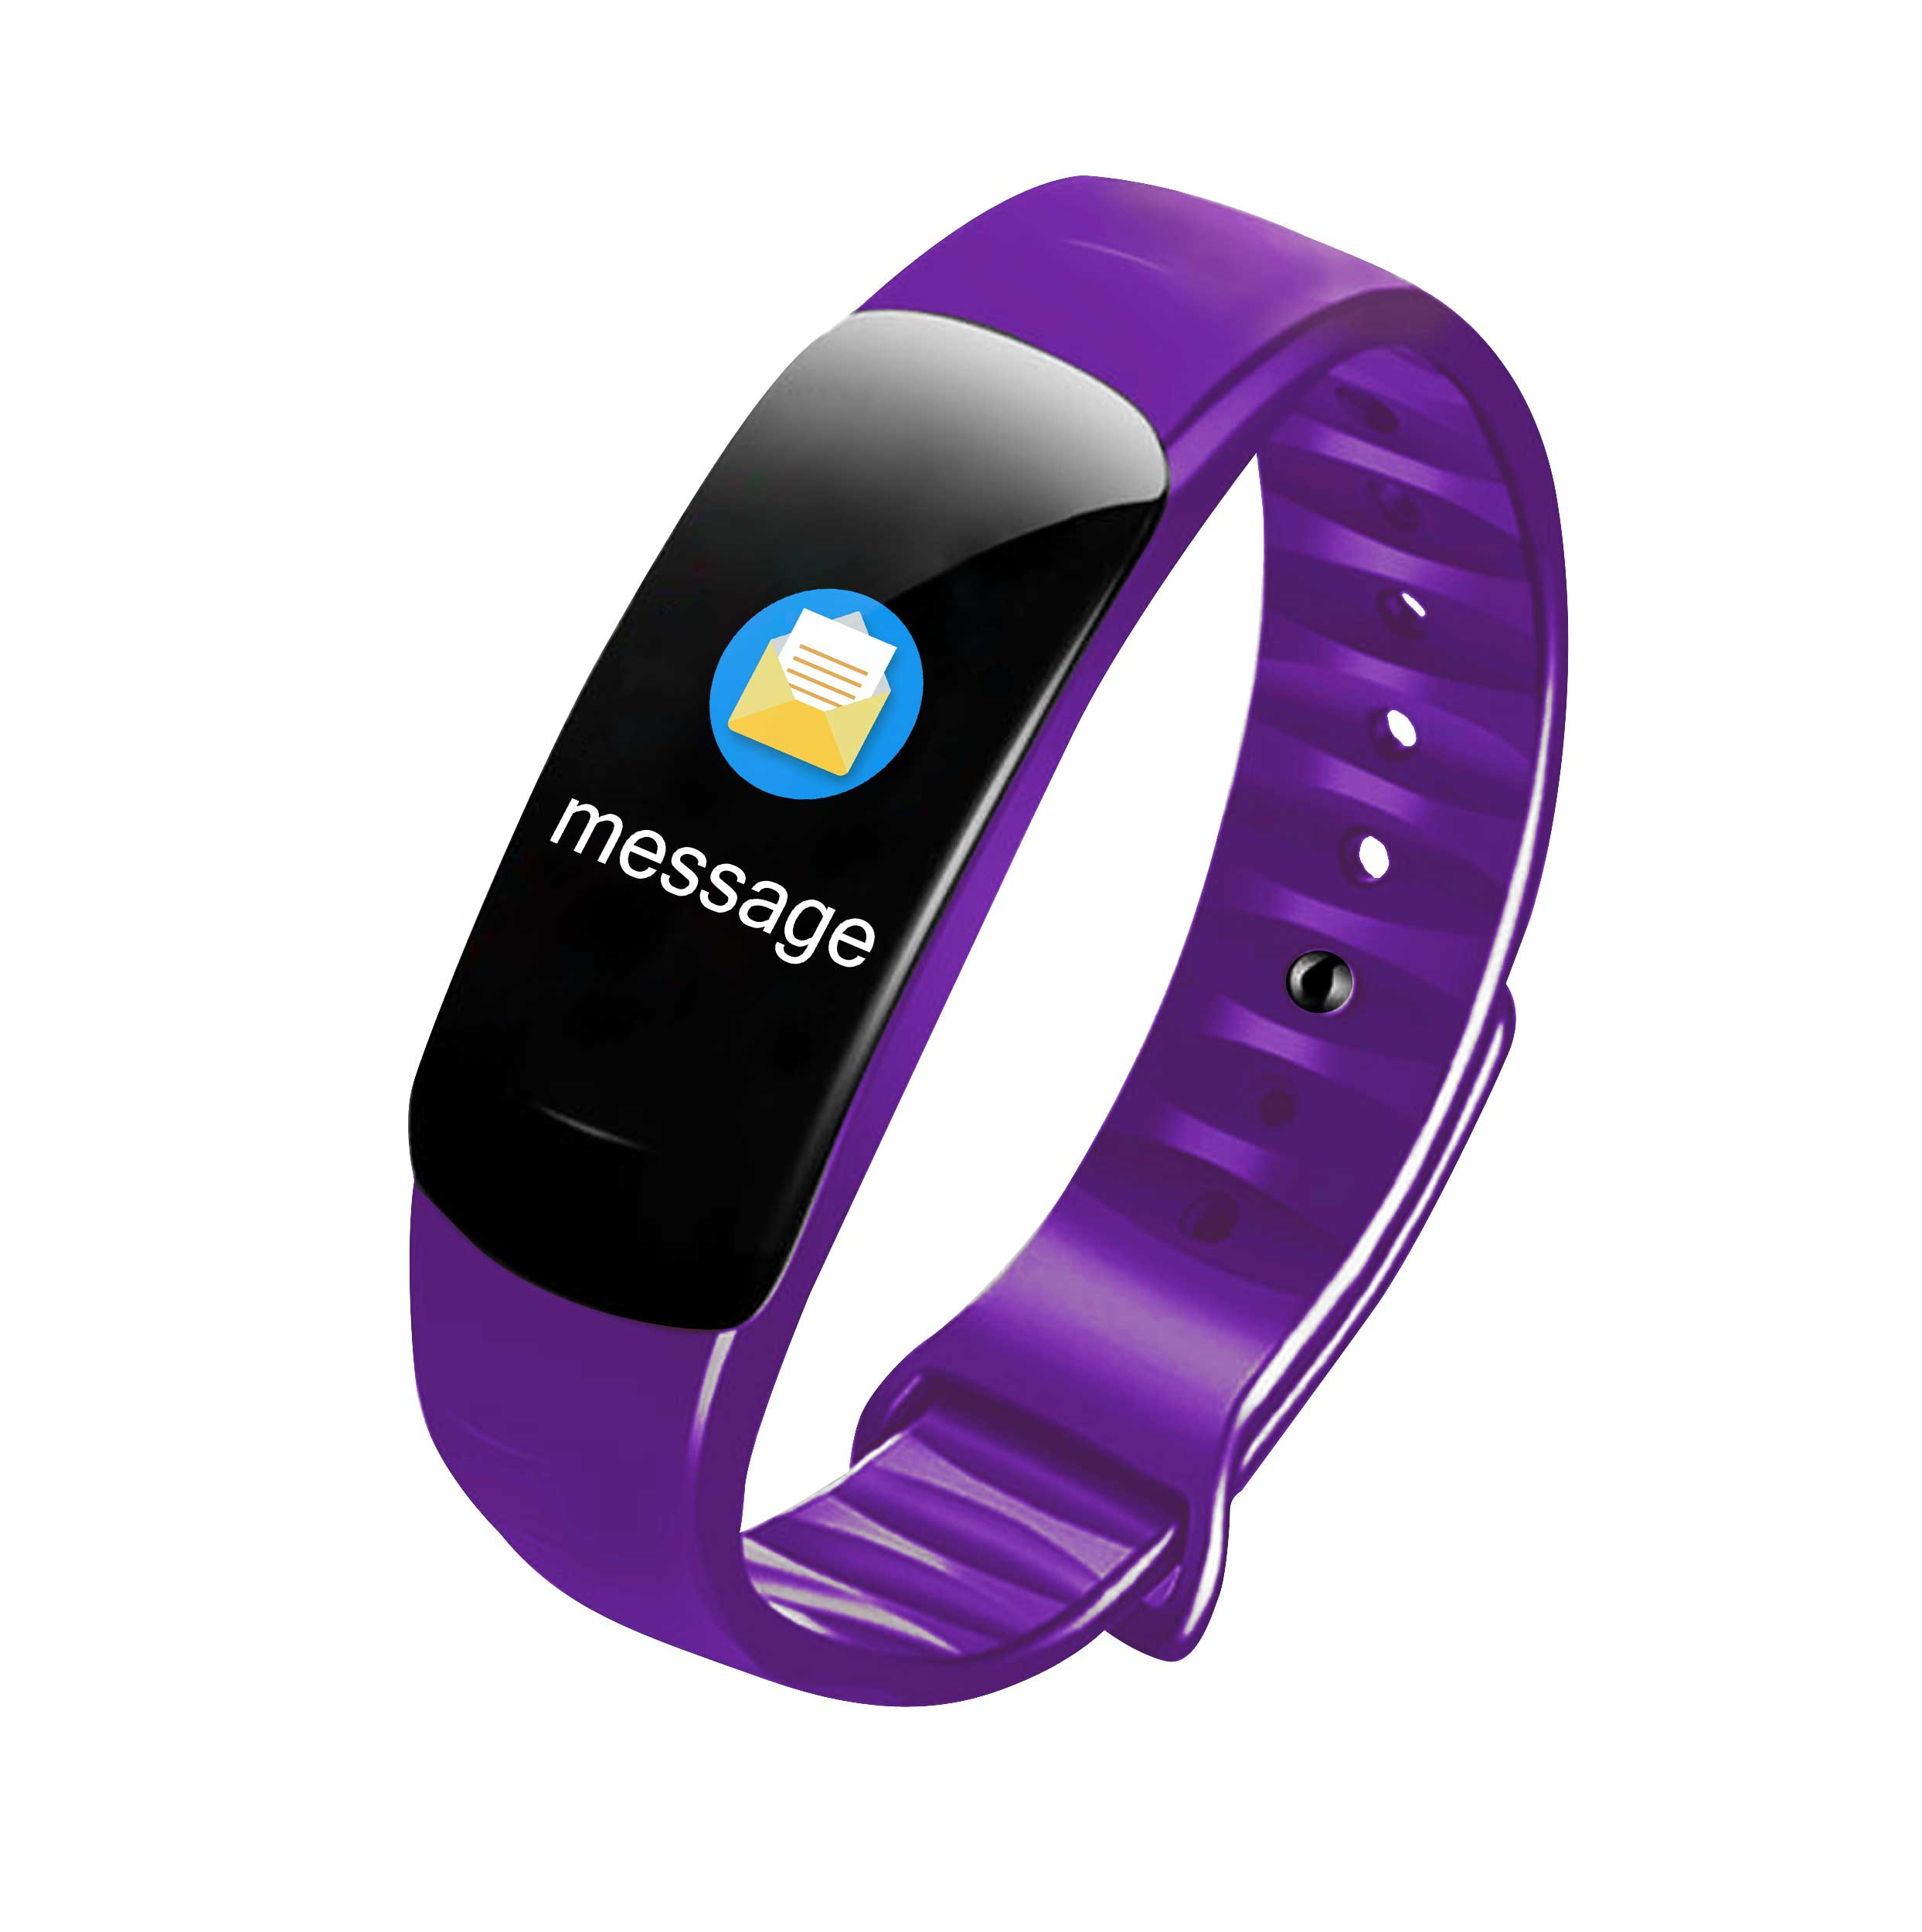 Fitness Bracelet Smart Watch Wristband Pedometer Heart Rate Monitor Activity Tracker smart bracelet purple